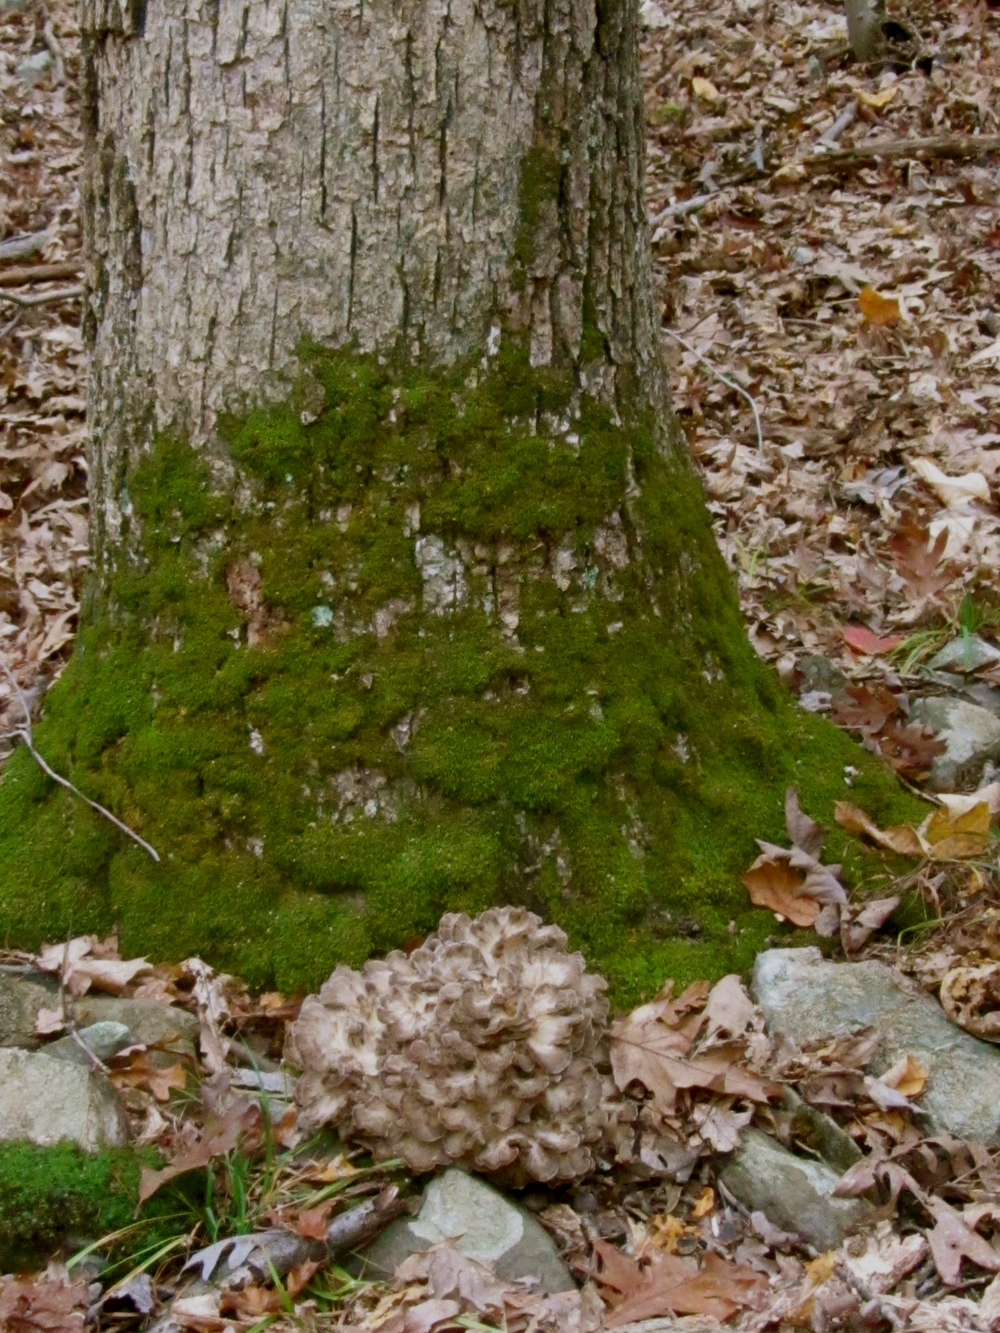 Maitaike mushroom growing at the base of a red oak tree.